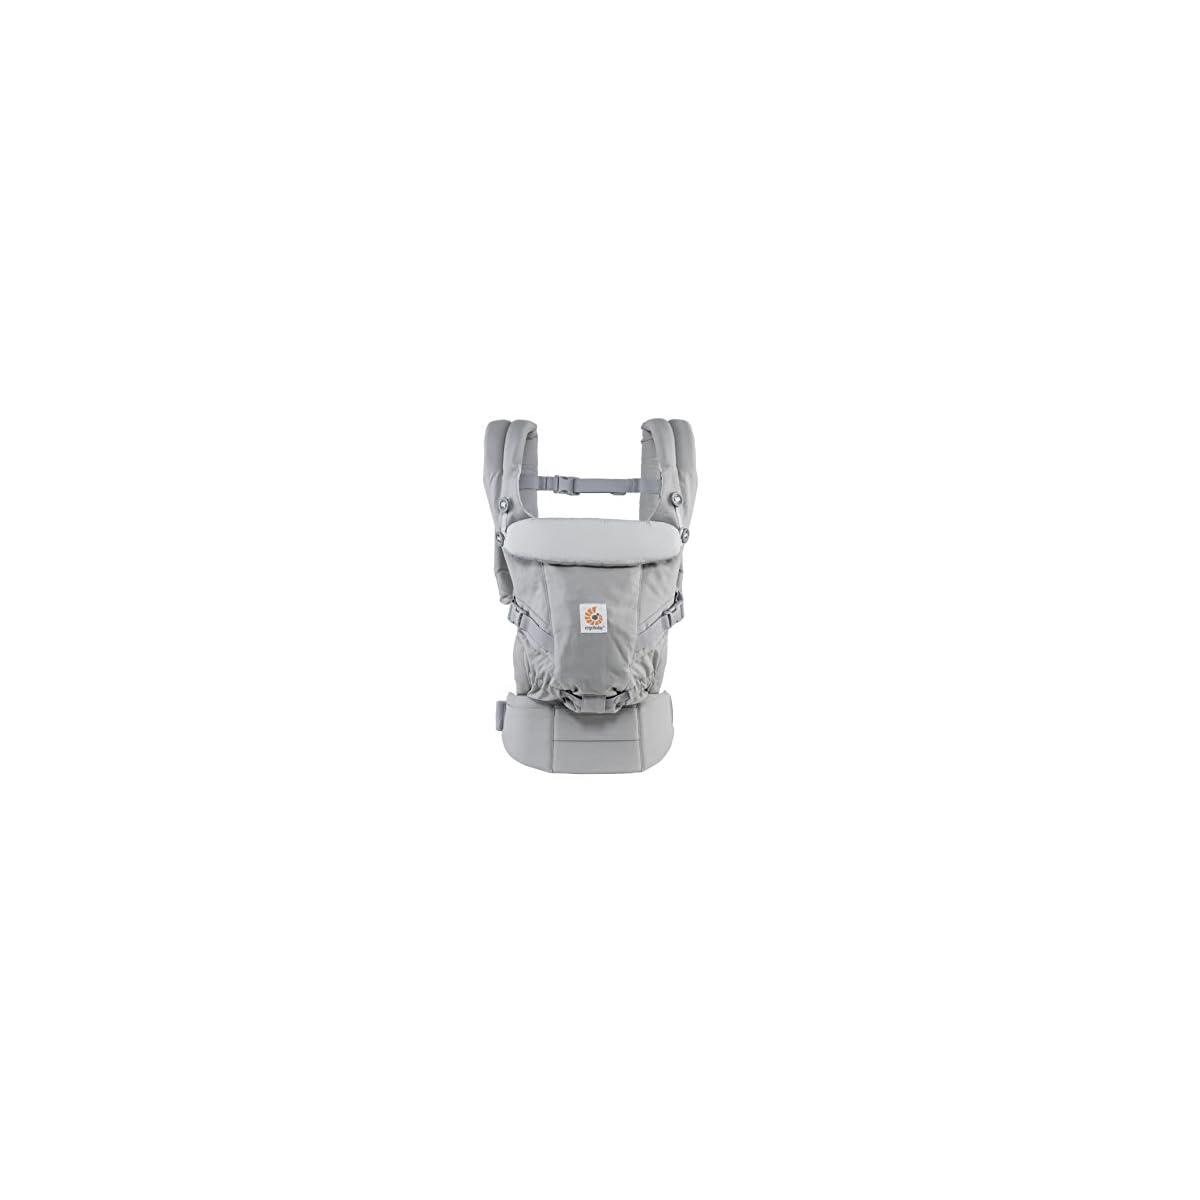 31TynHGMmkL. SS1200  - Ergobaby Adapt - Mochila portabebé, color gris